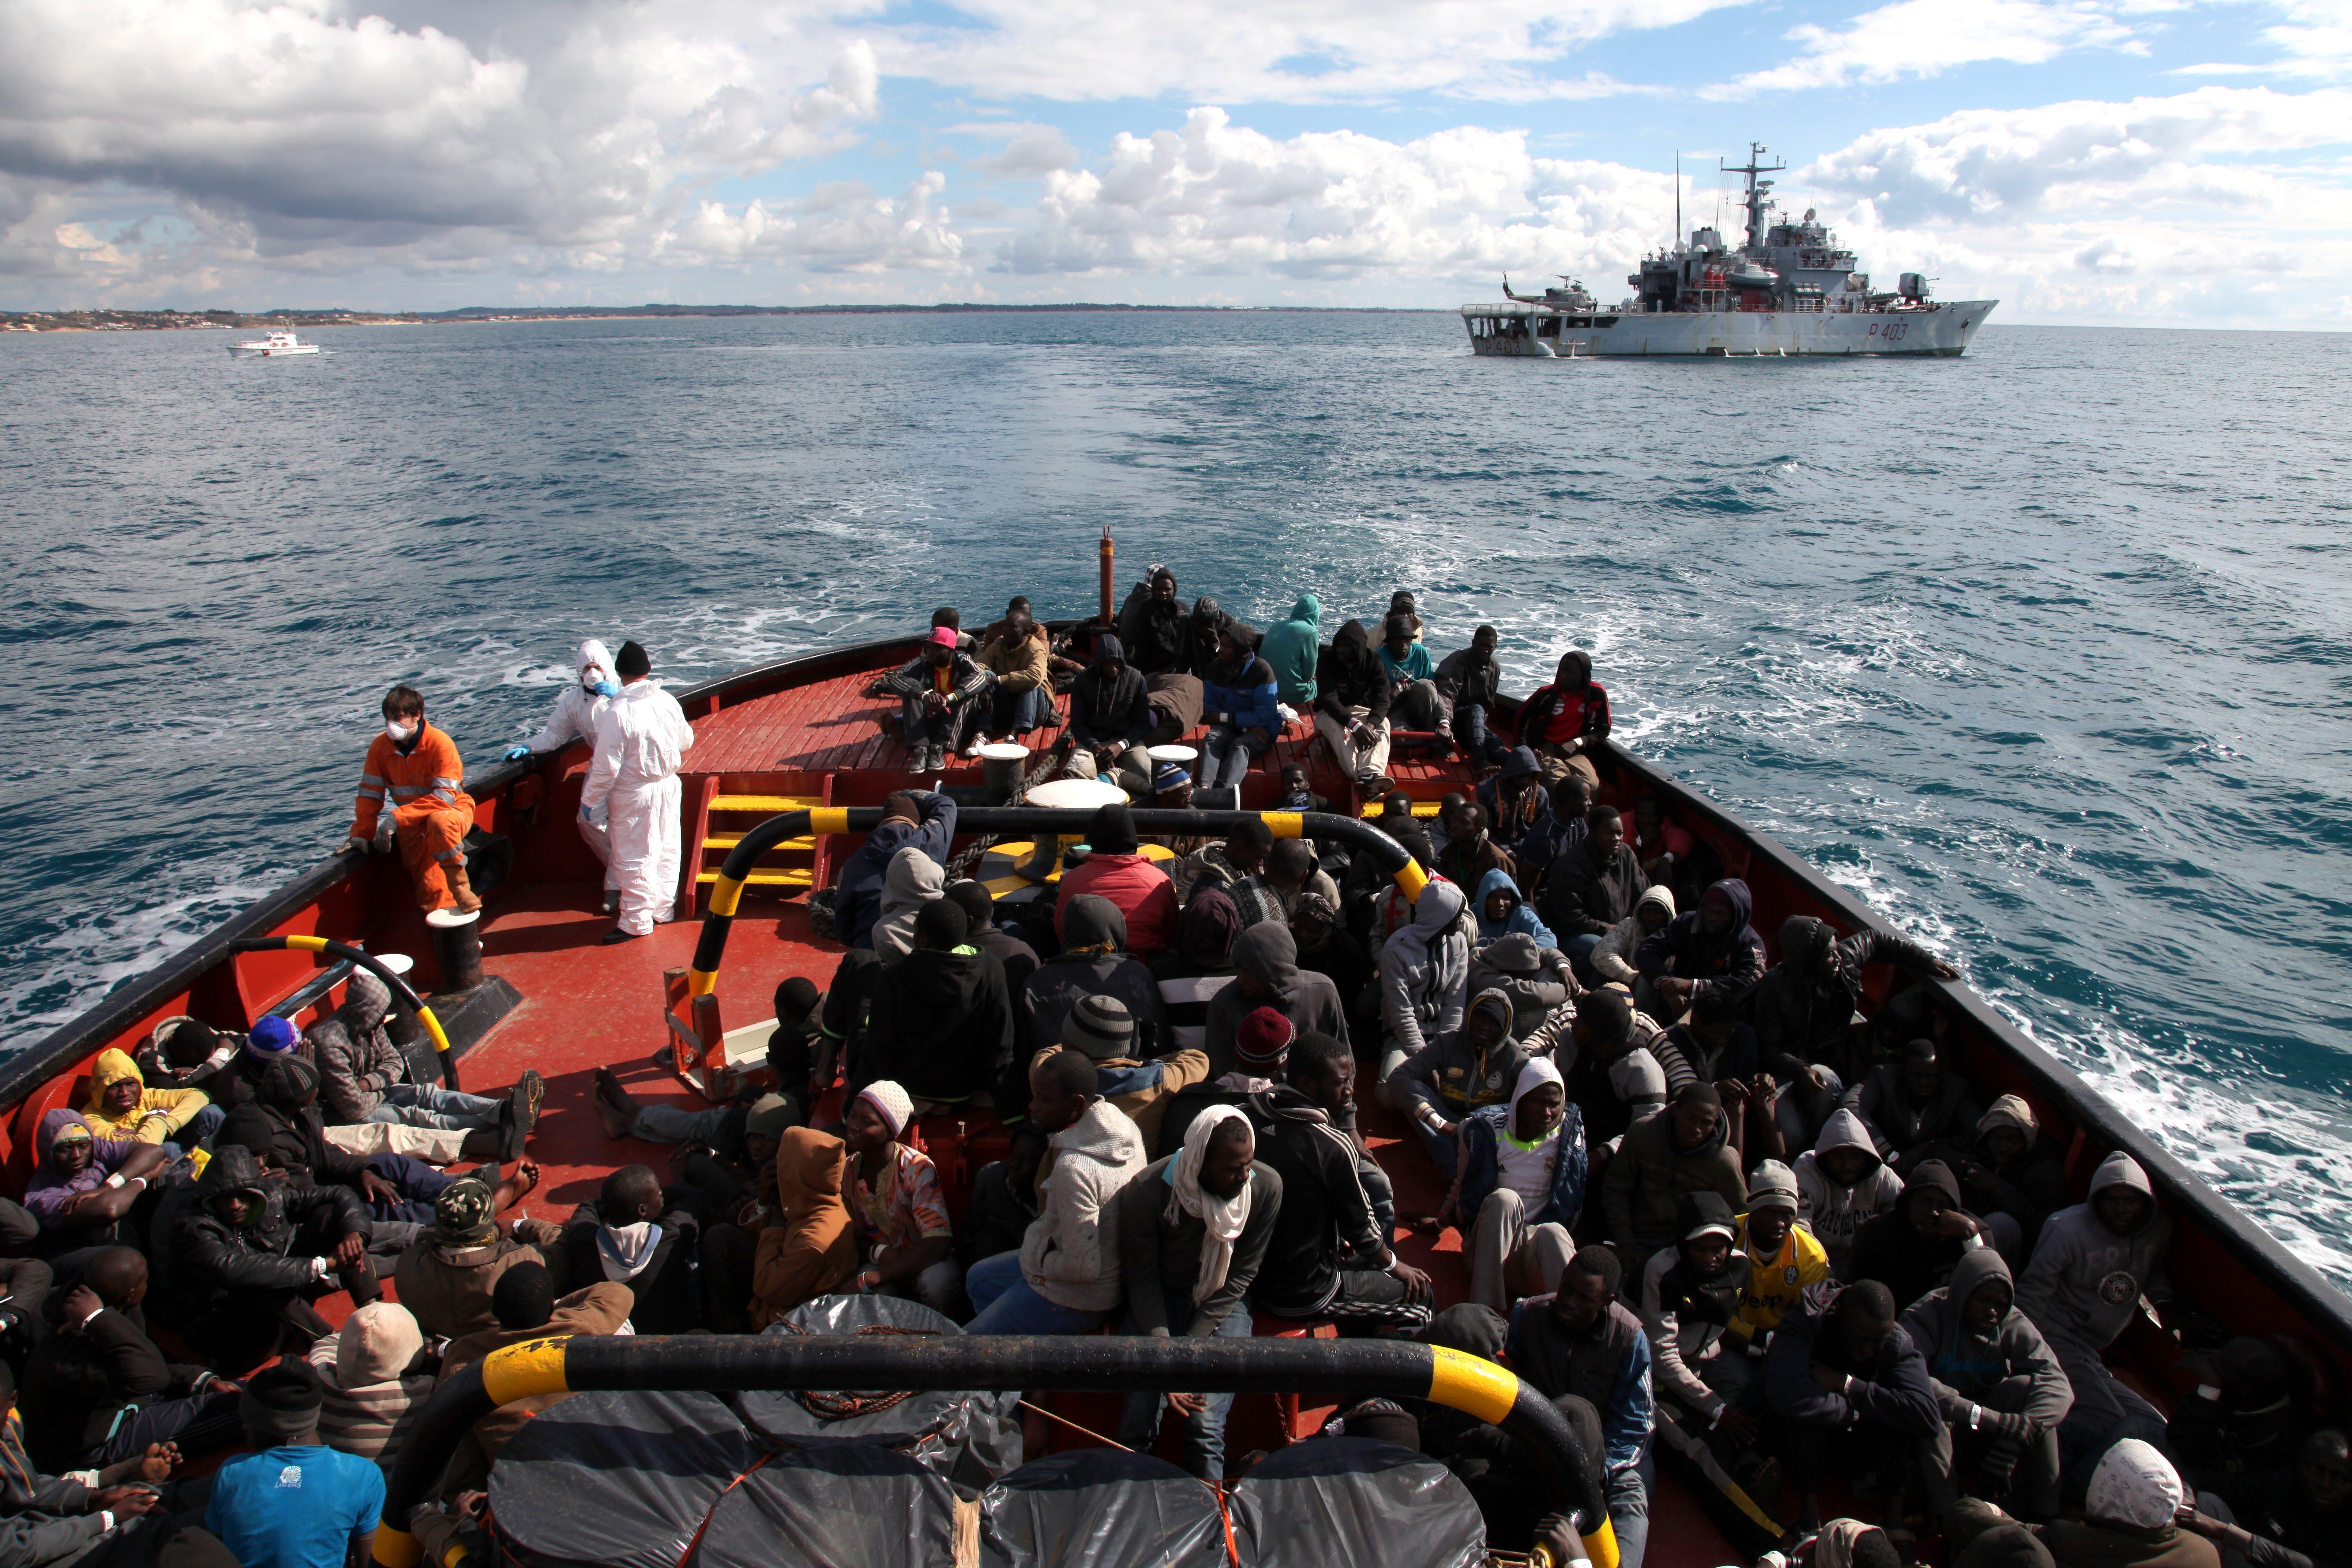 Italy. Rescue at sea